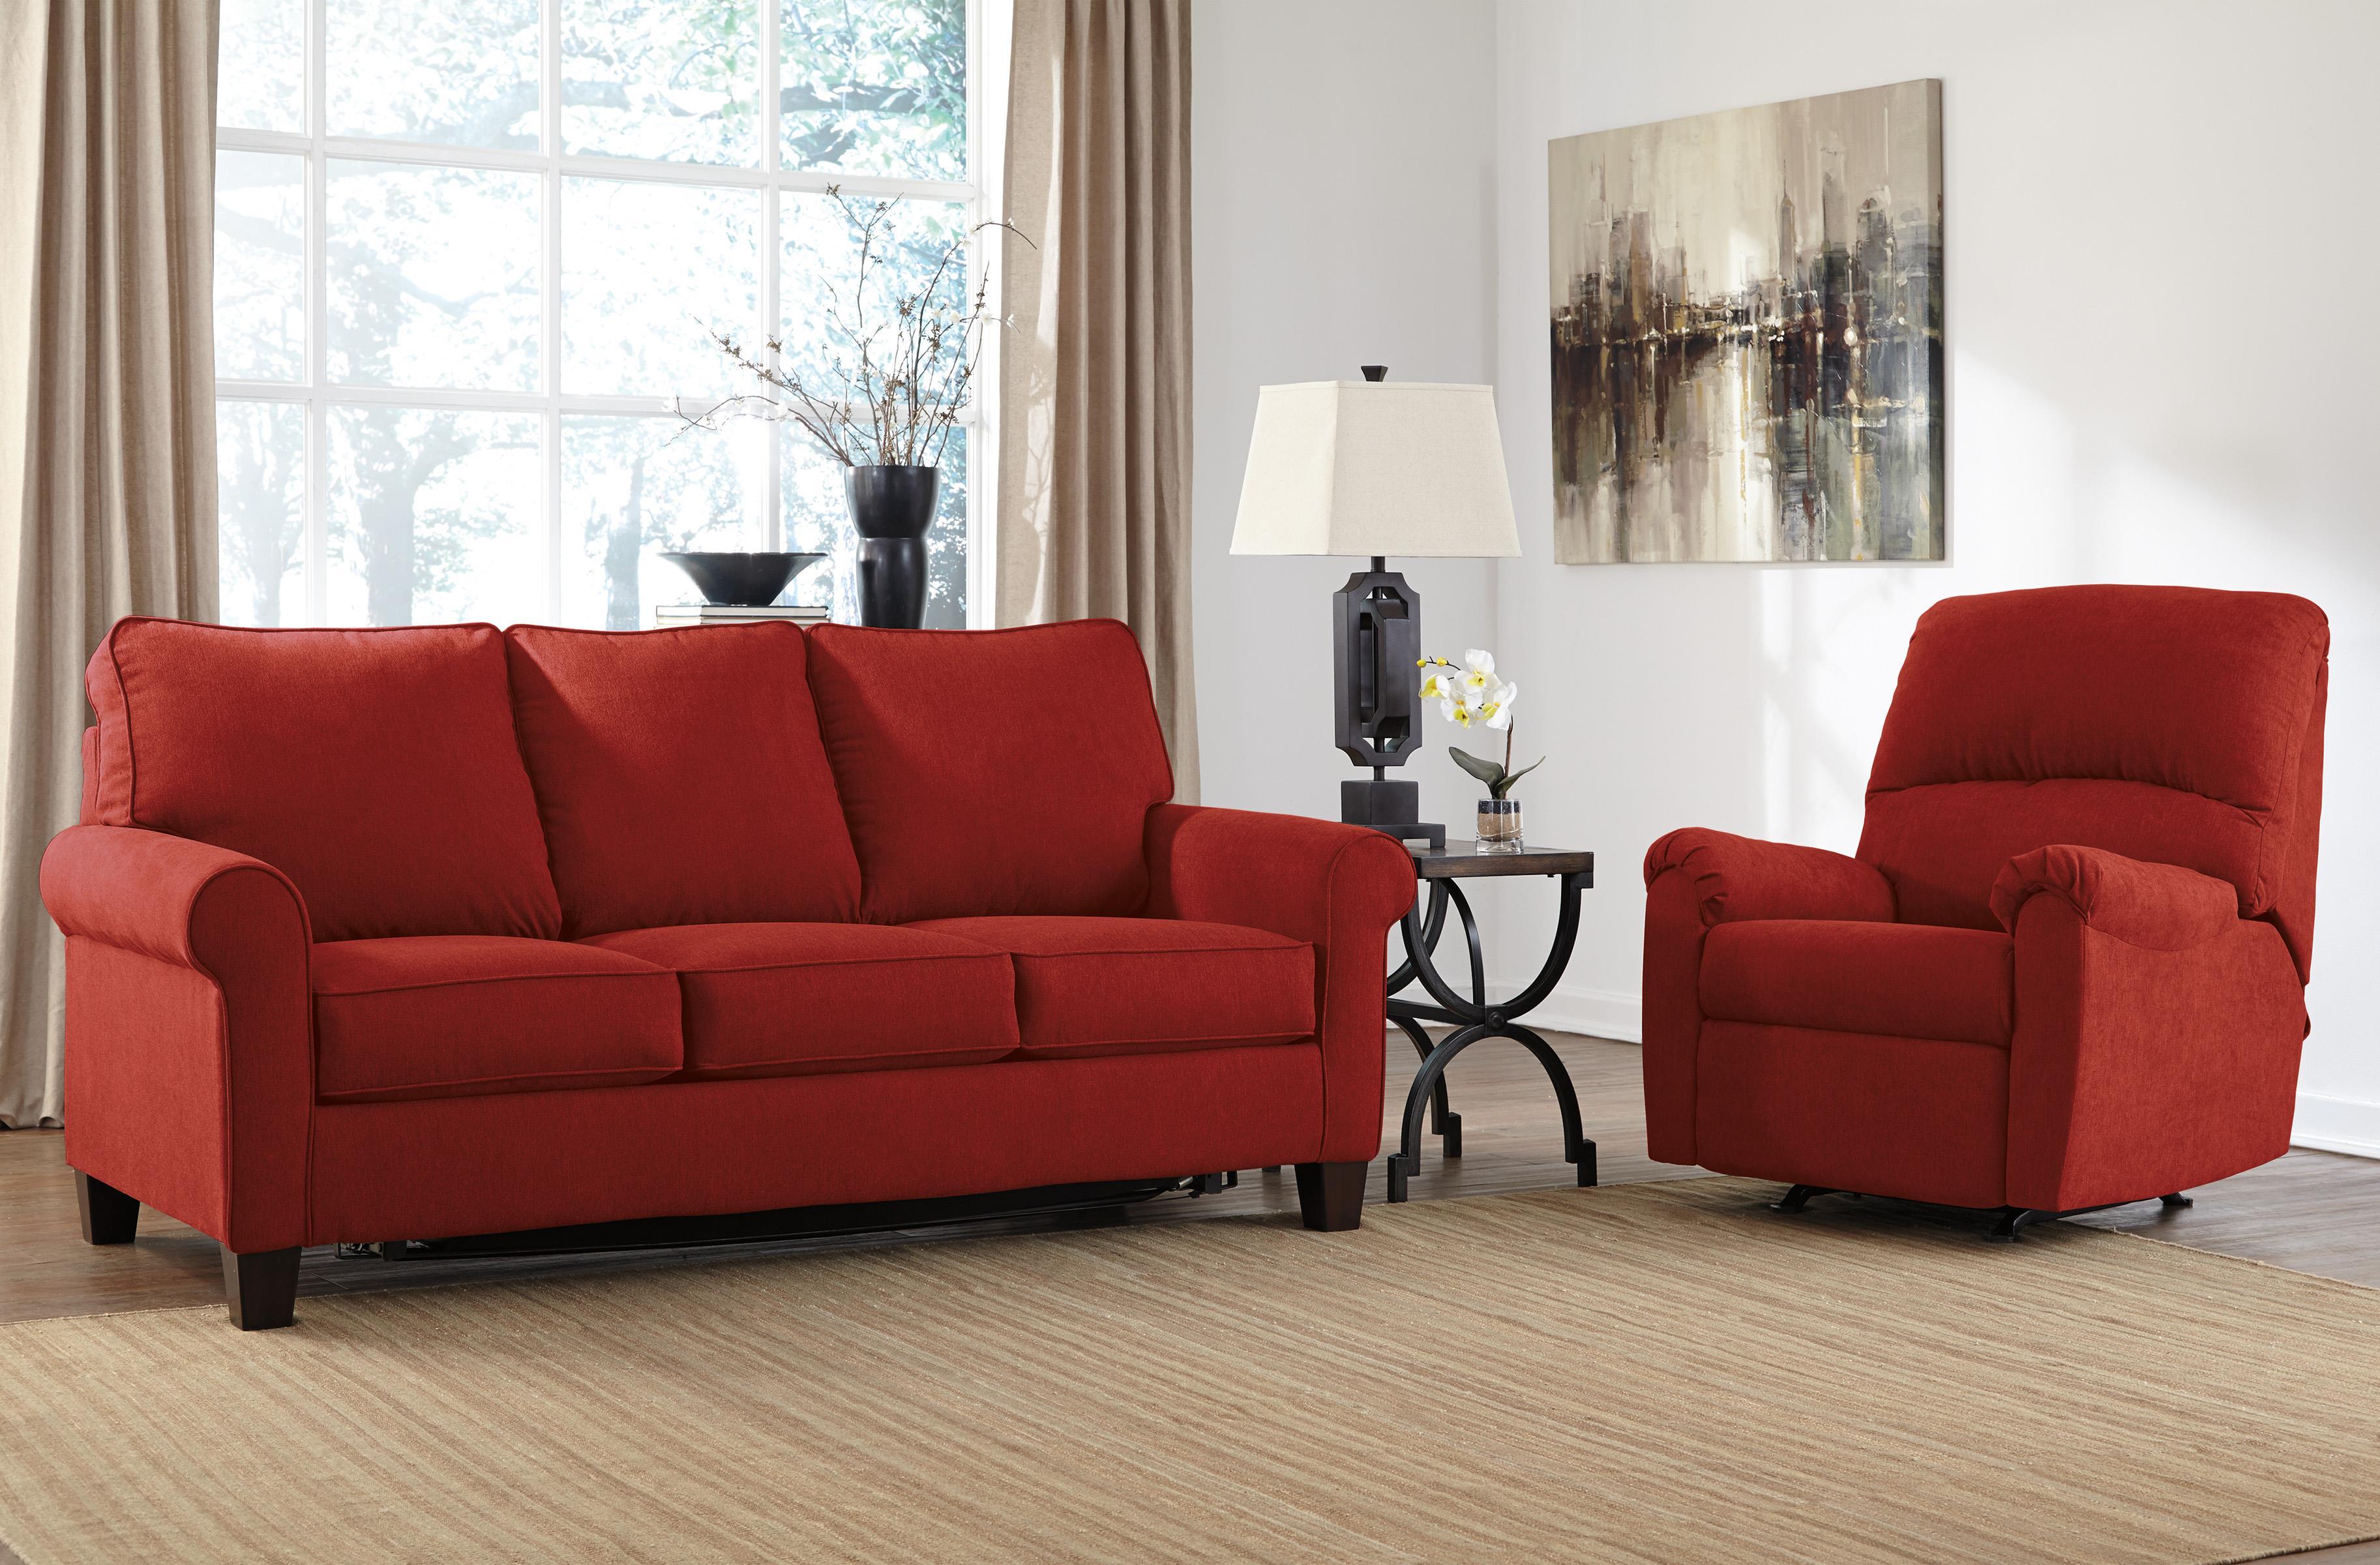 Signature Design by Ashley Zeth - Crimson Stationary Living Room Group - Item Number: 27102 Living Room Group 1